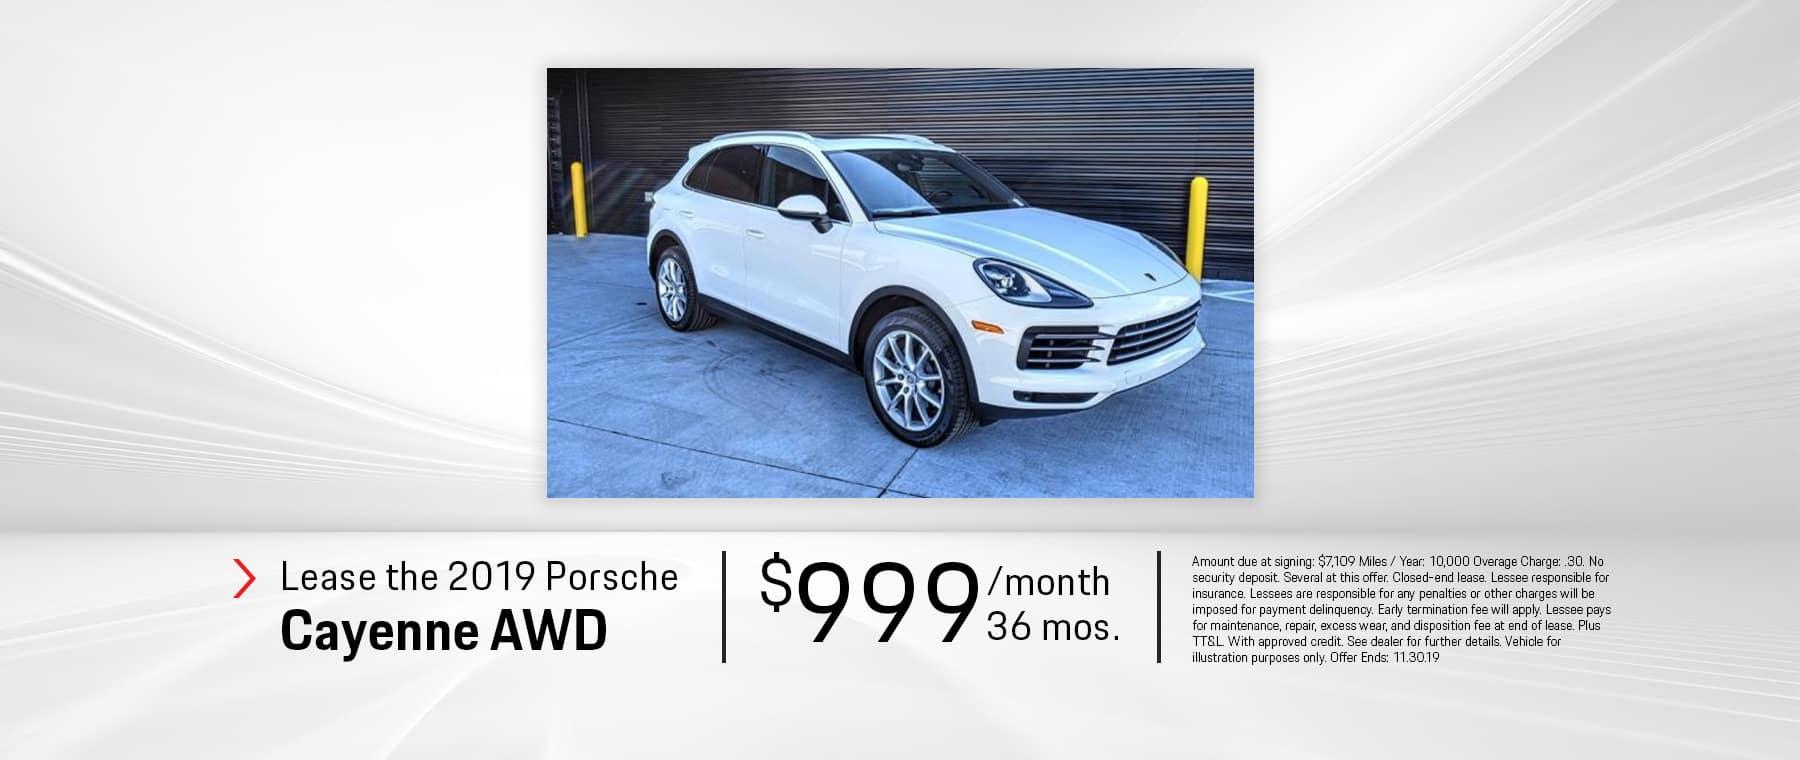 Lease the 2019 Porsche Cayenne AWD